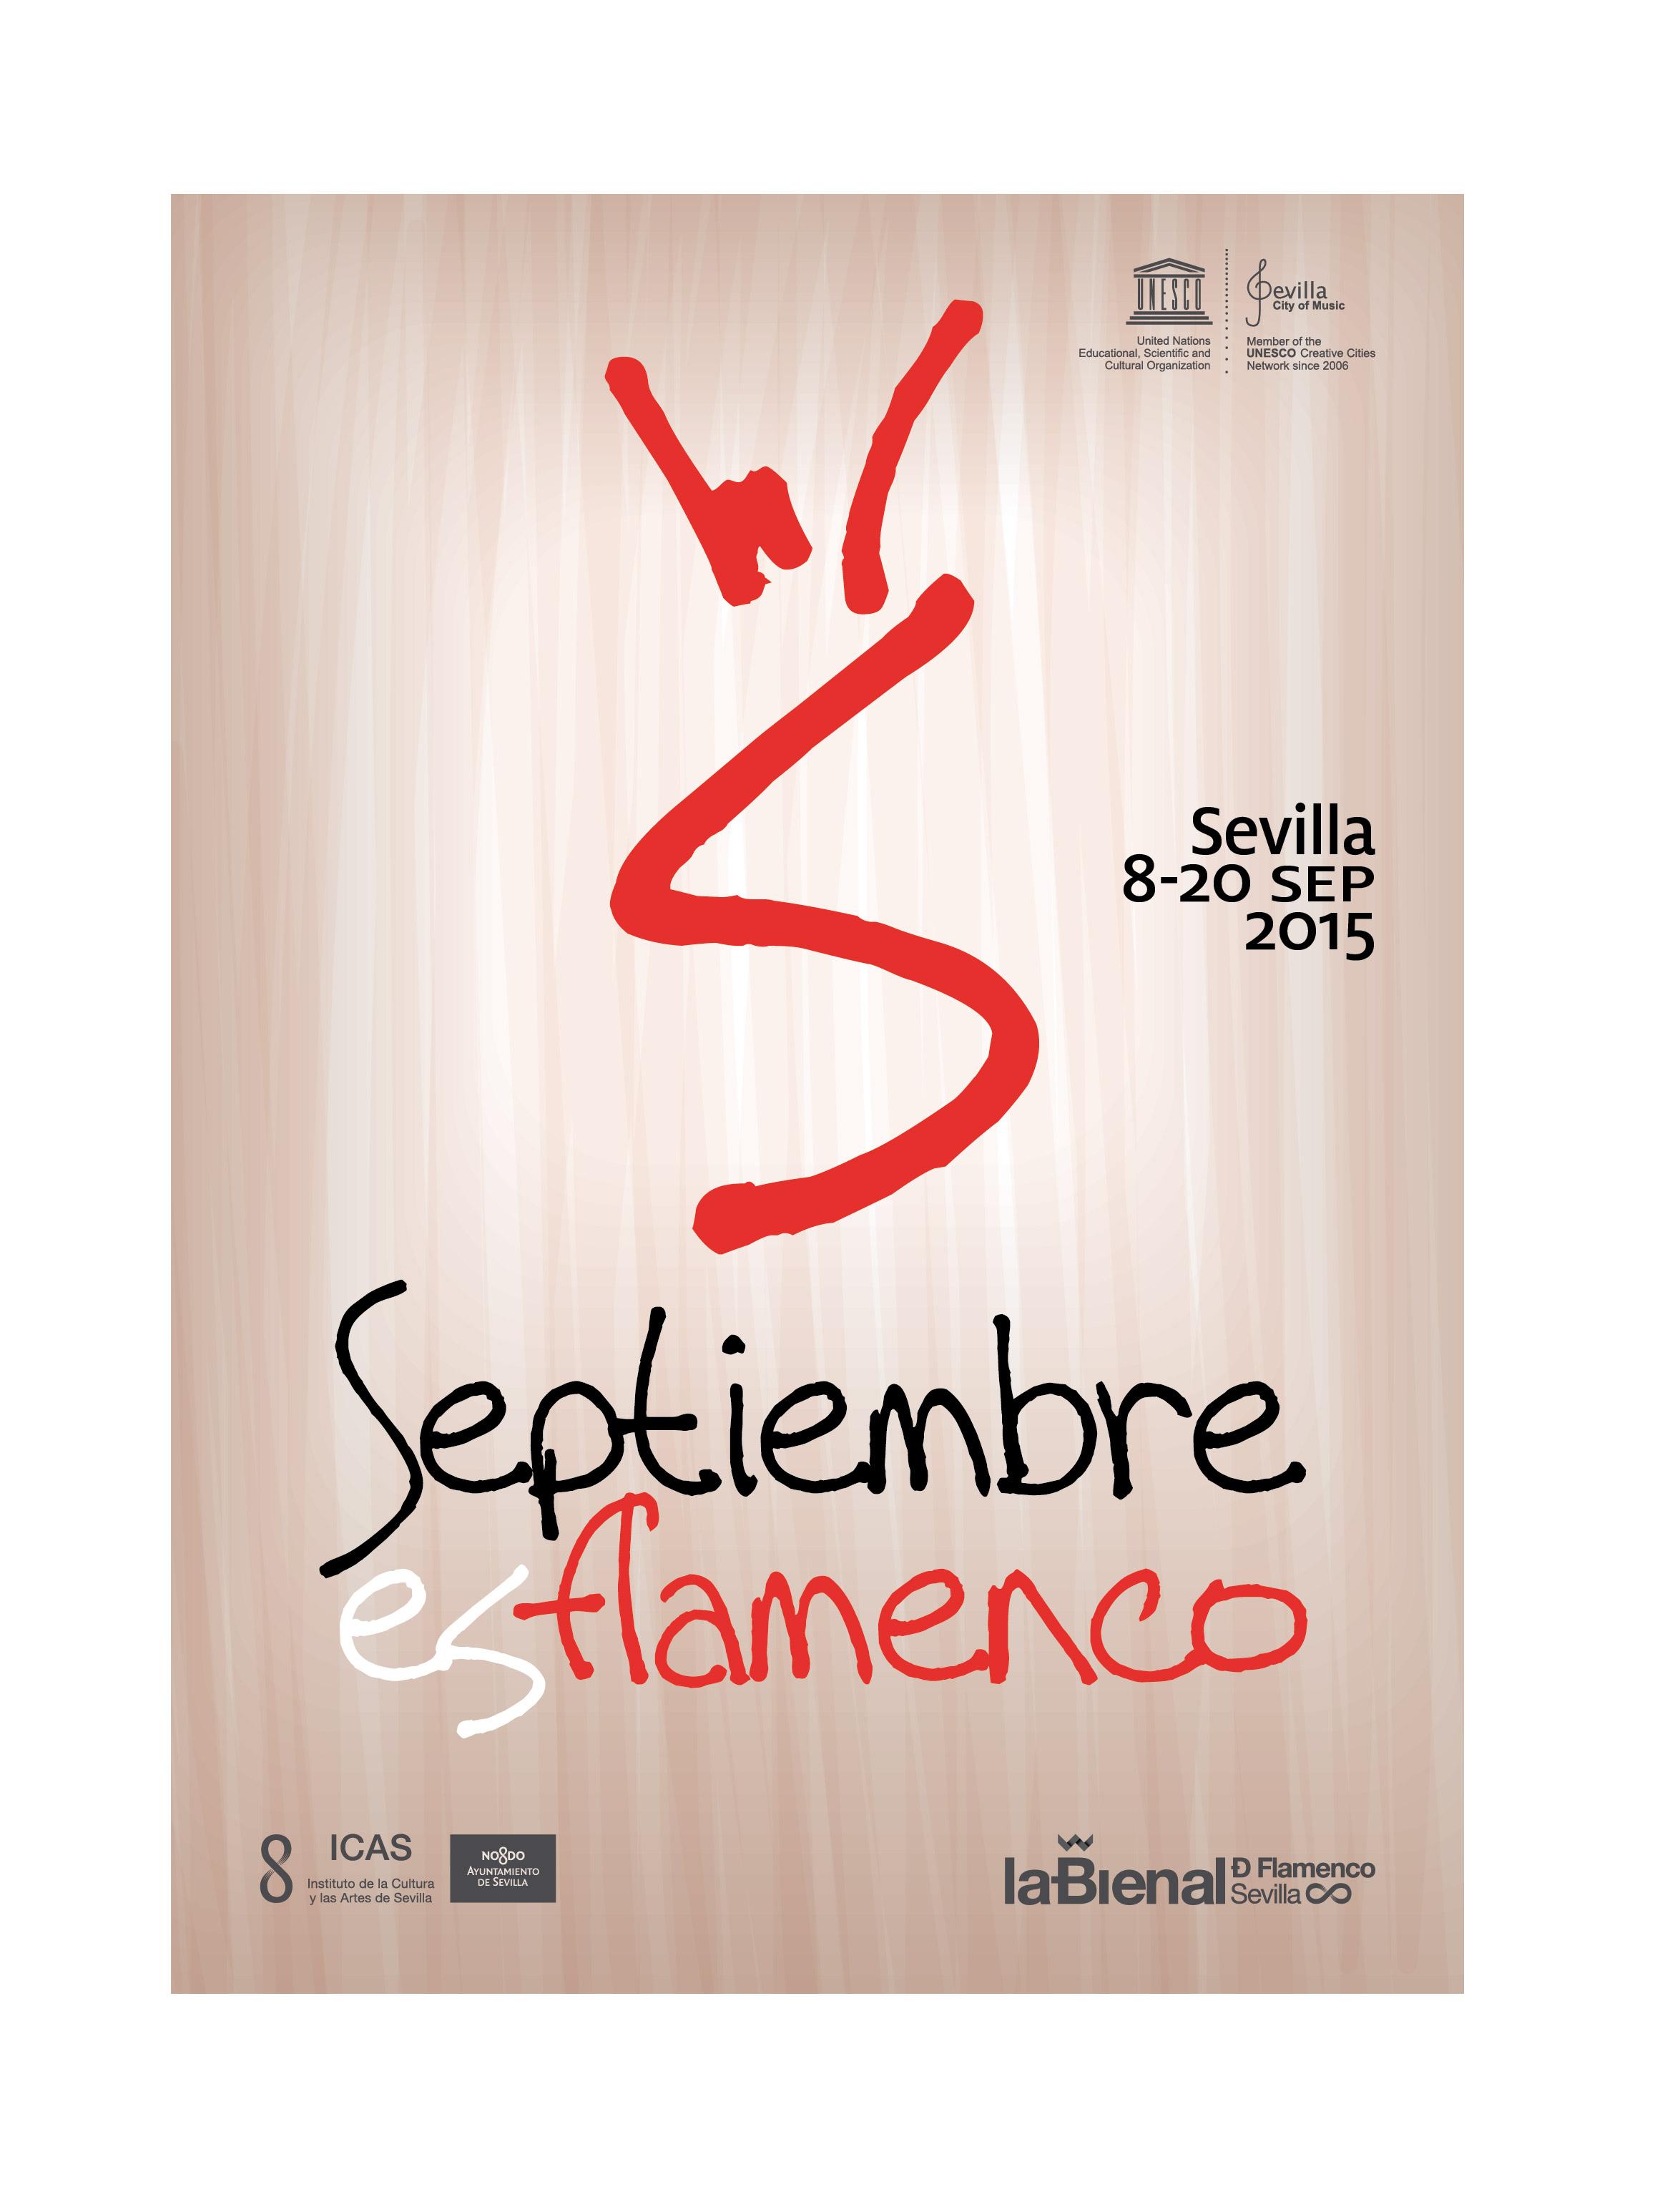 Septiembre es flamenco 2015 Sevilla